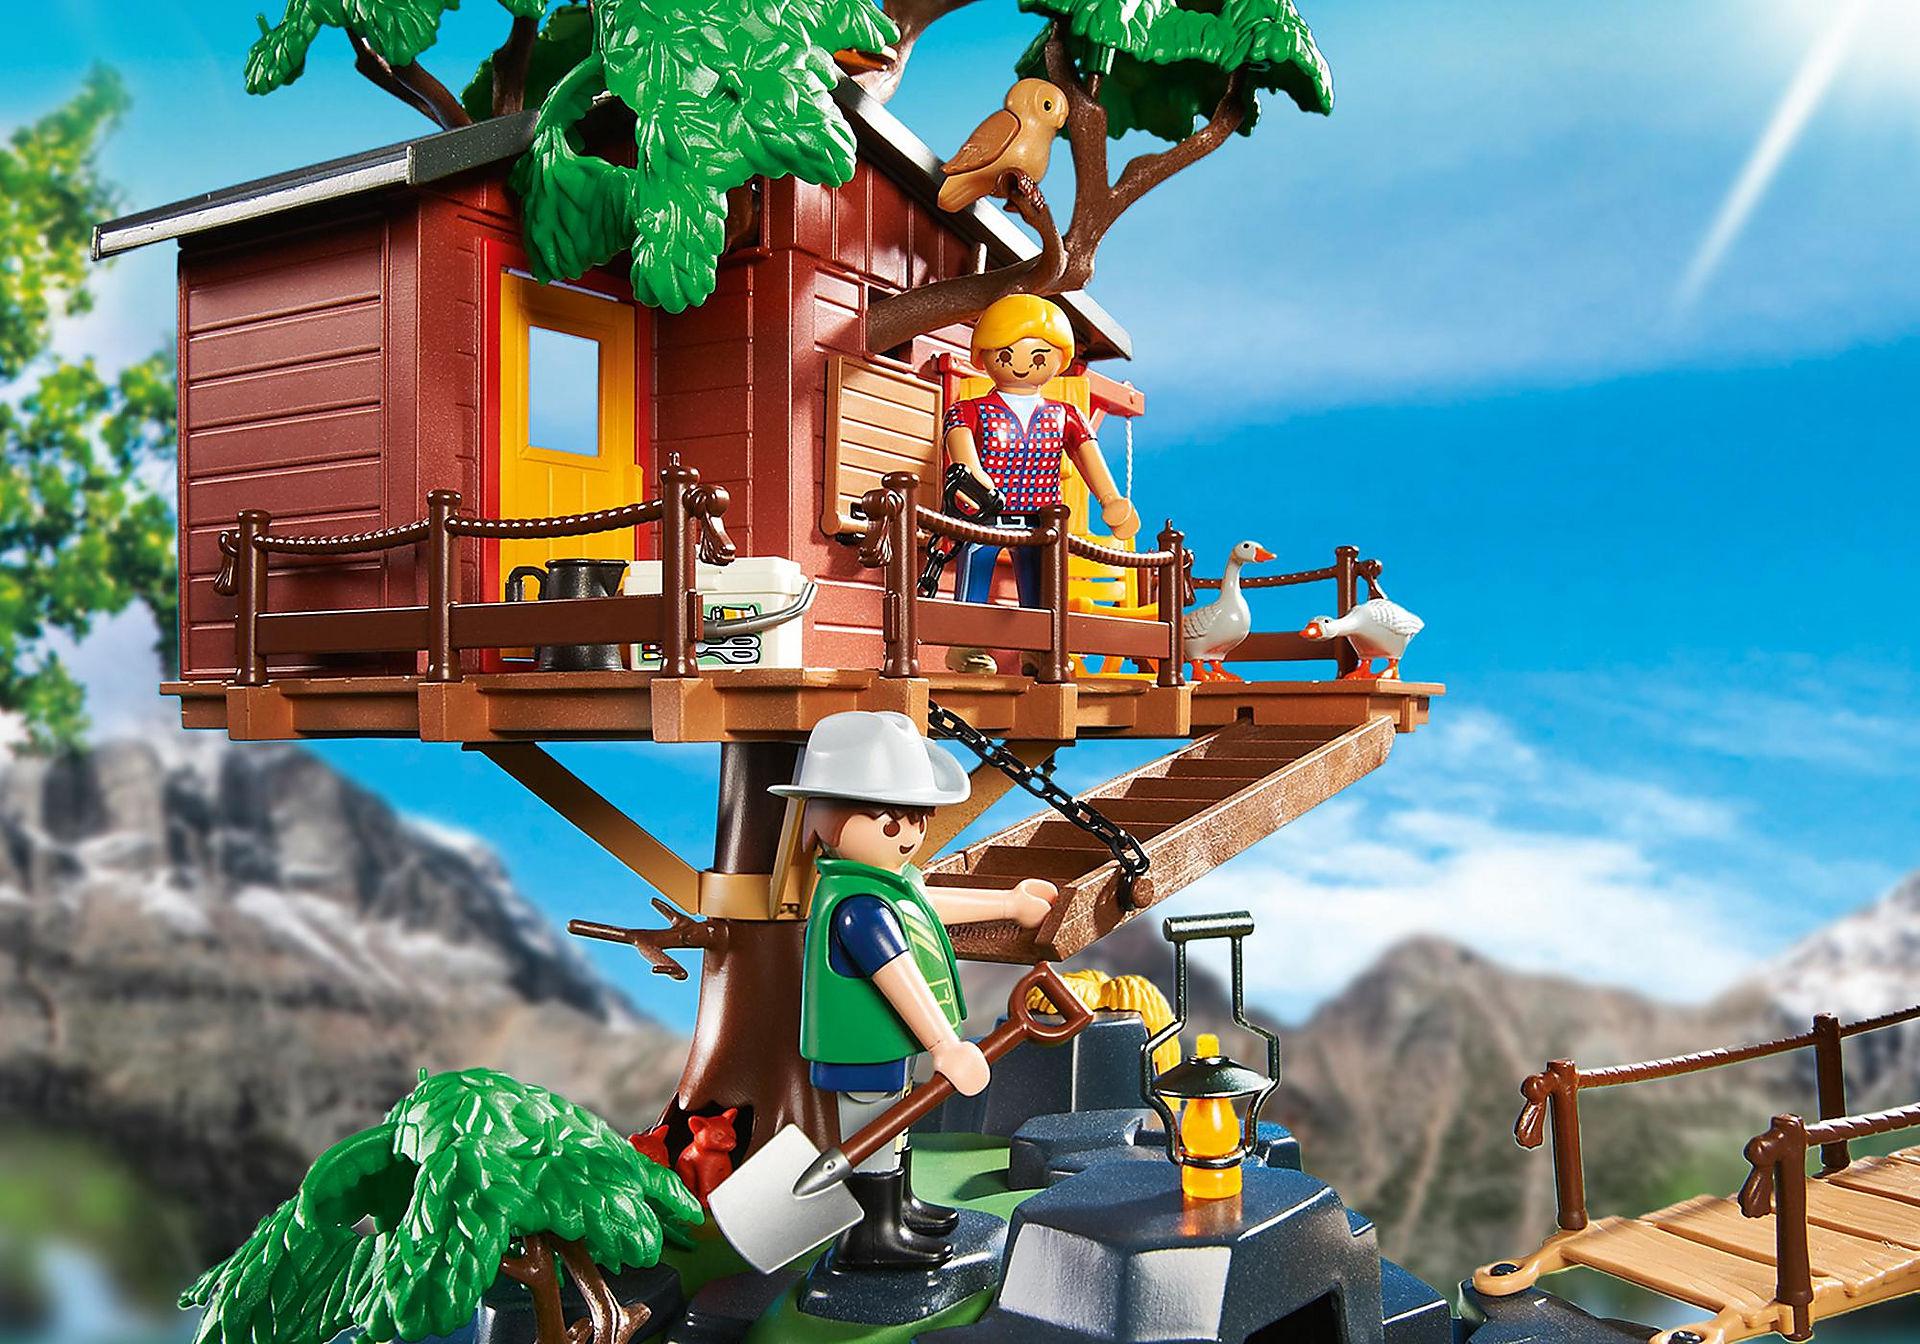 http://media.playmobil.com/i/playmobil/5557_product_extra2/Casa del Árbol de Aventuras